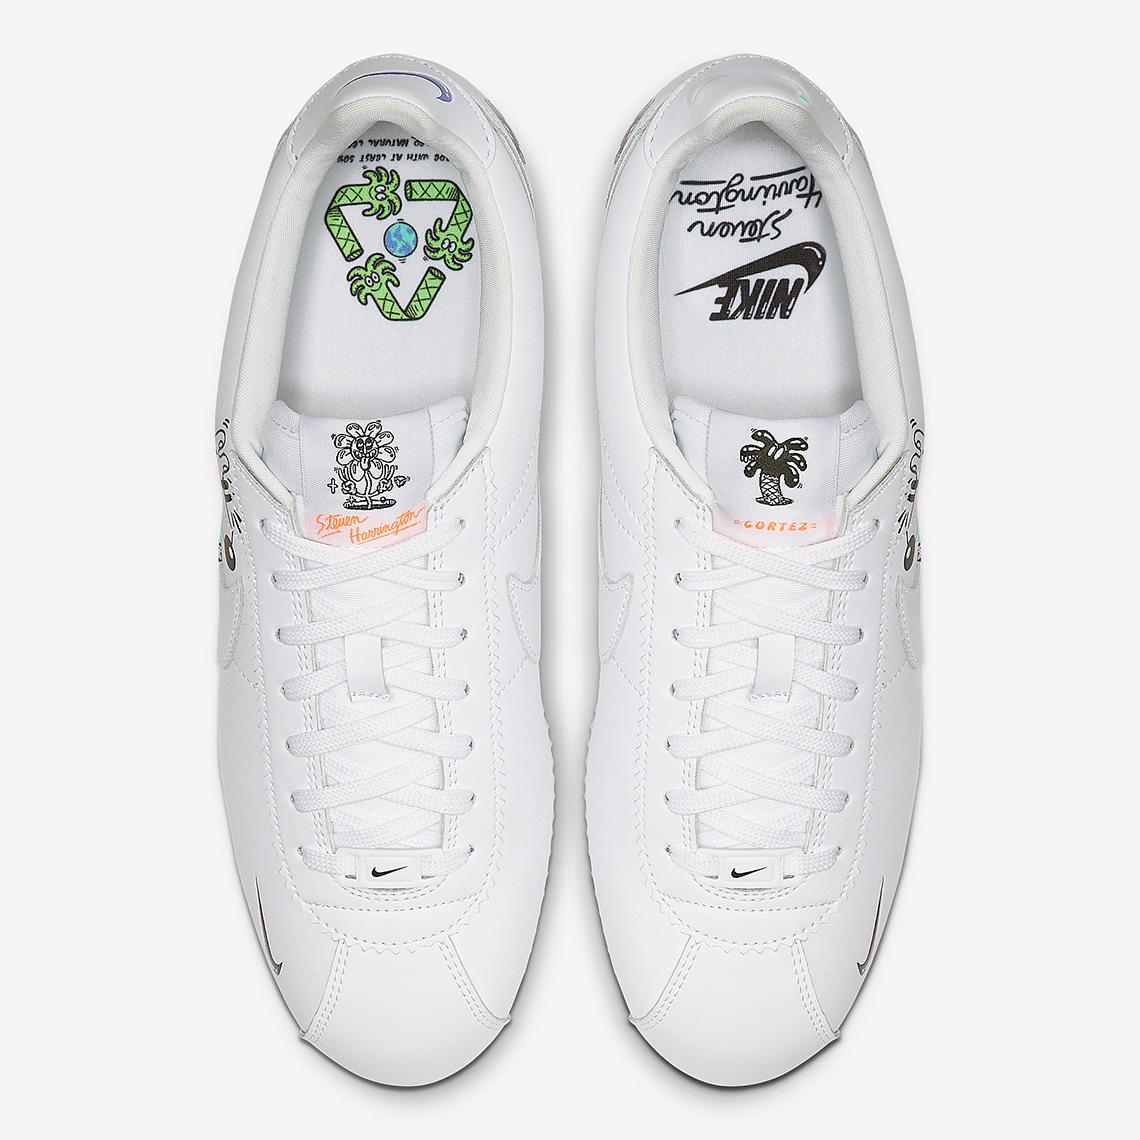 Steven Harrington x Nike Air Force 1 Earth Day 2019   Custom